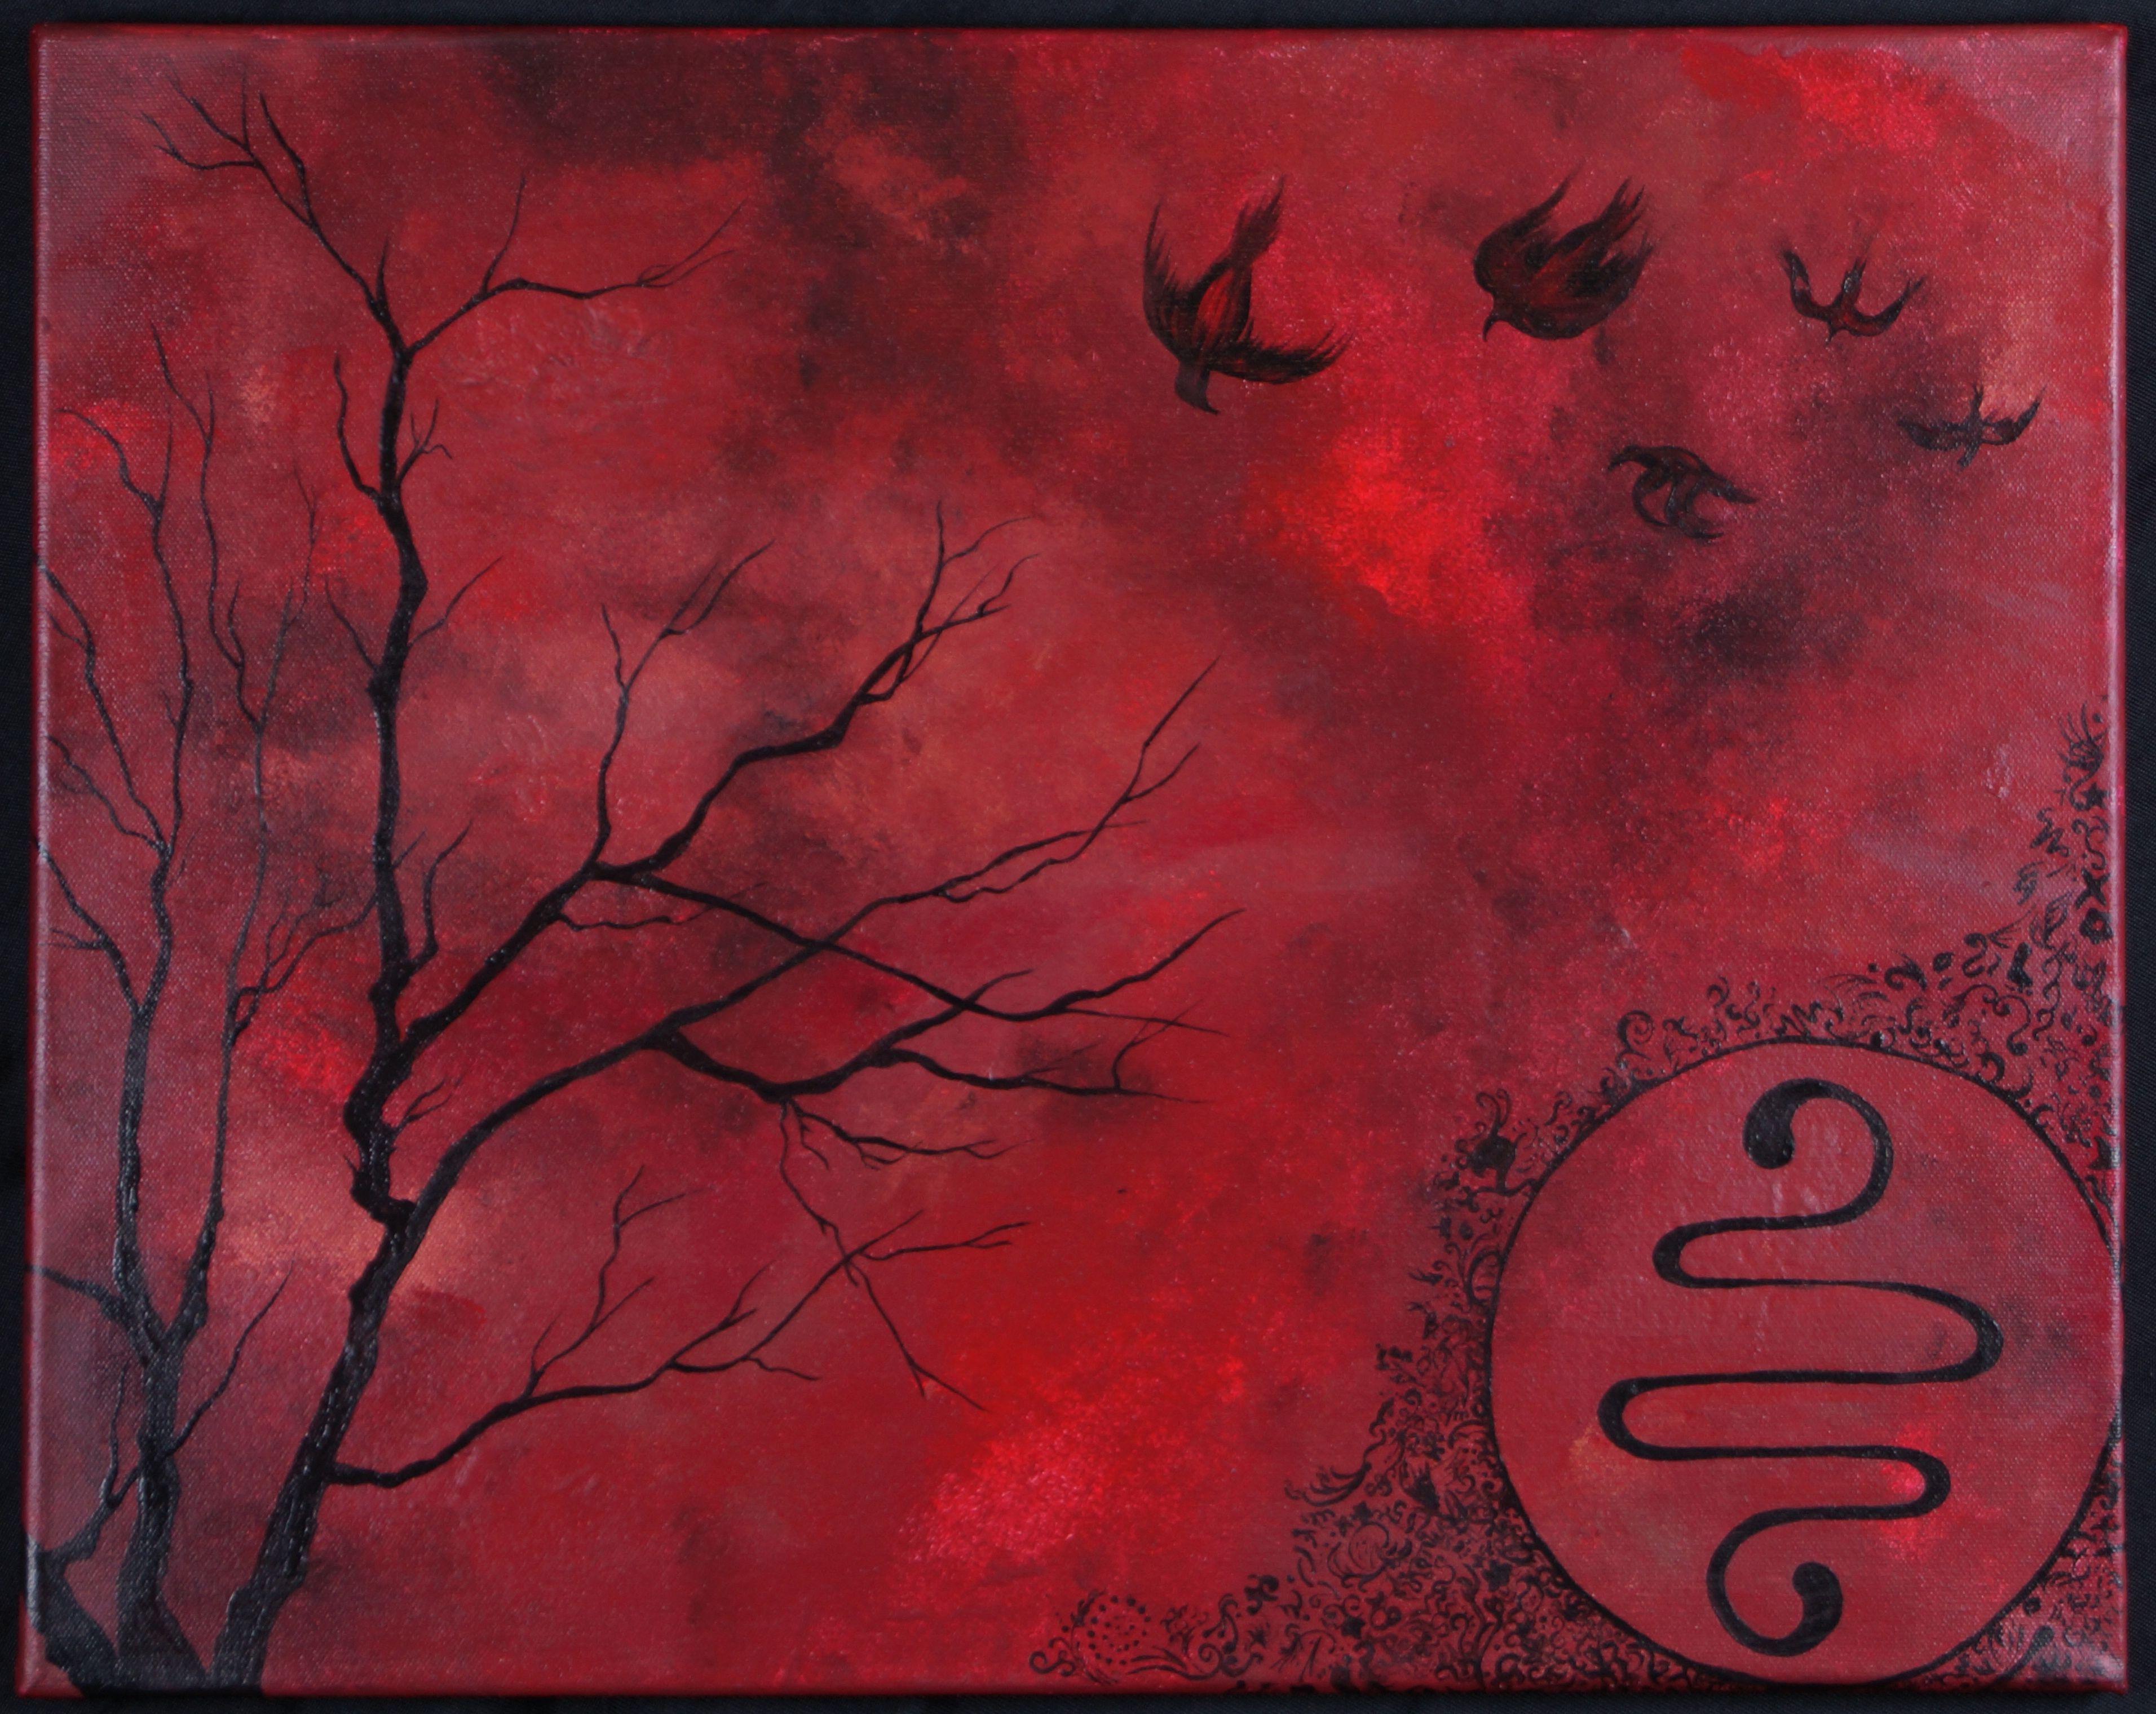 red moon symbolism - photo #47